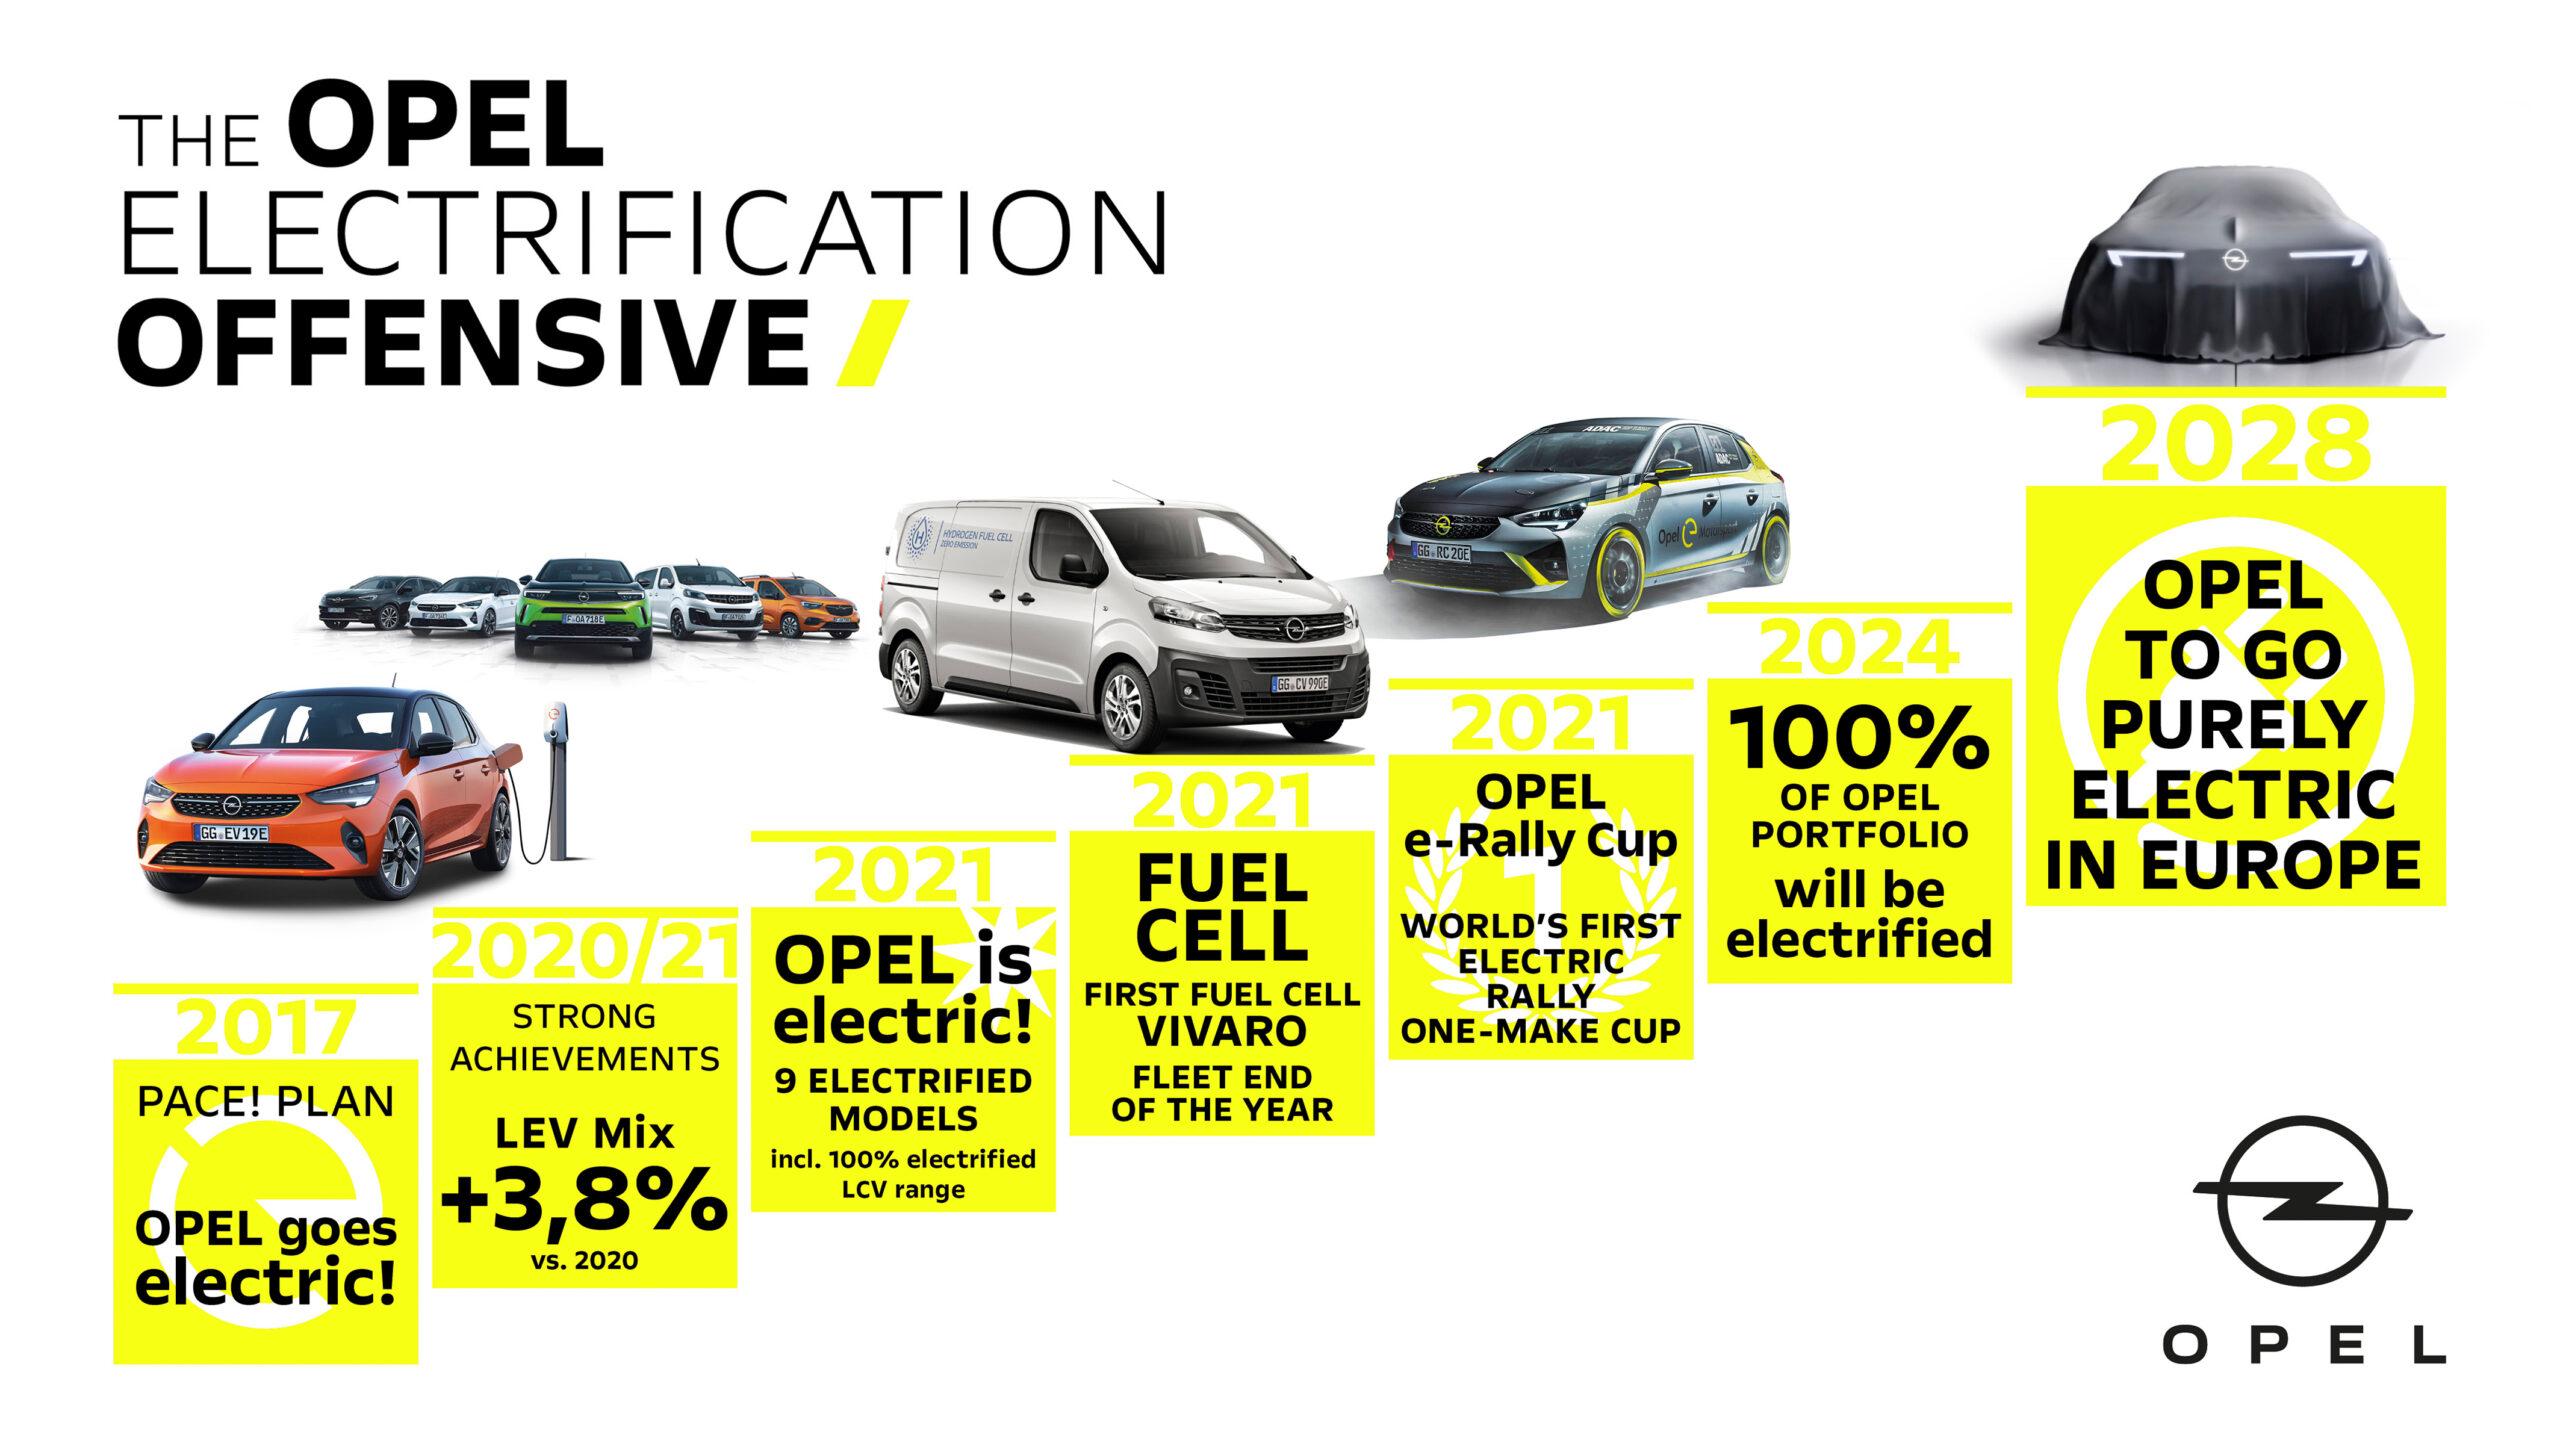 Electrification of Opel